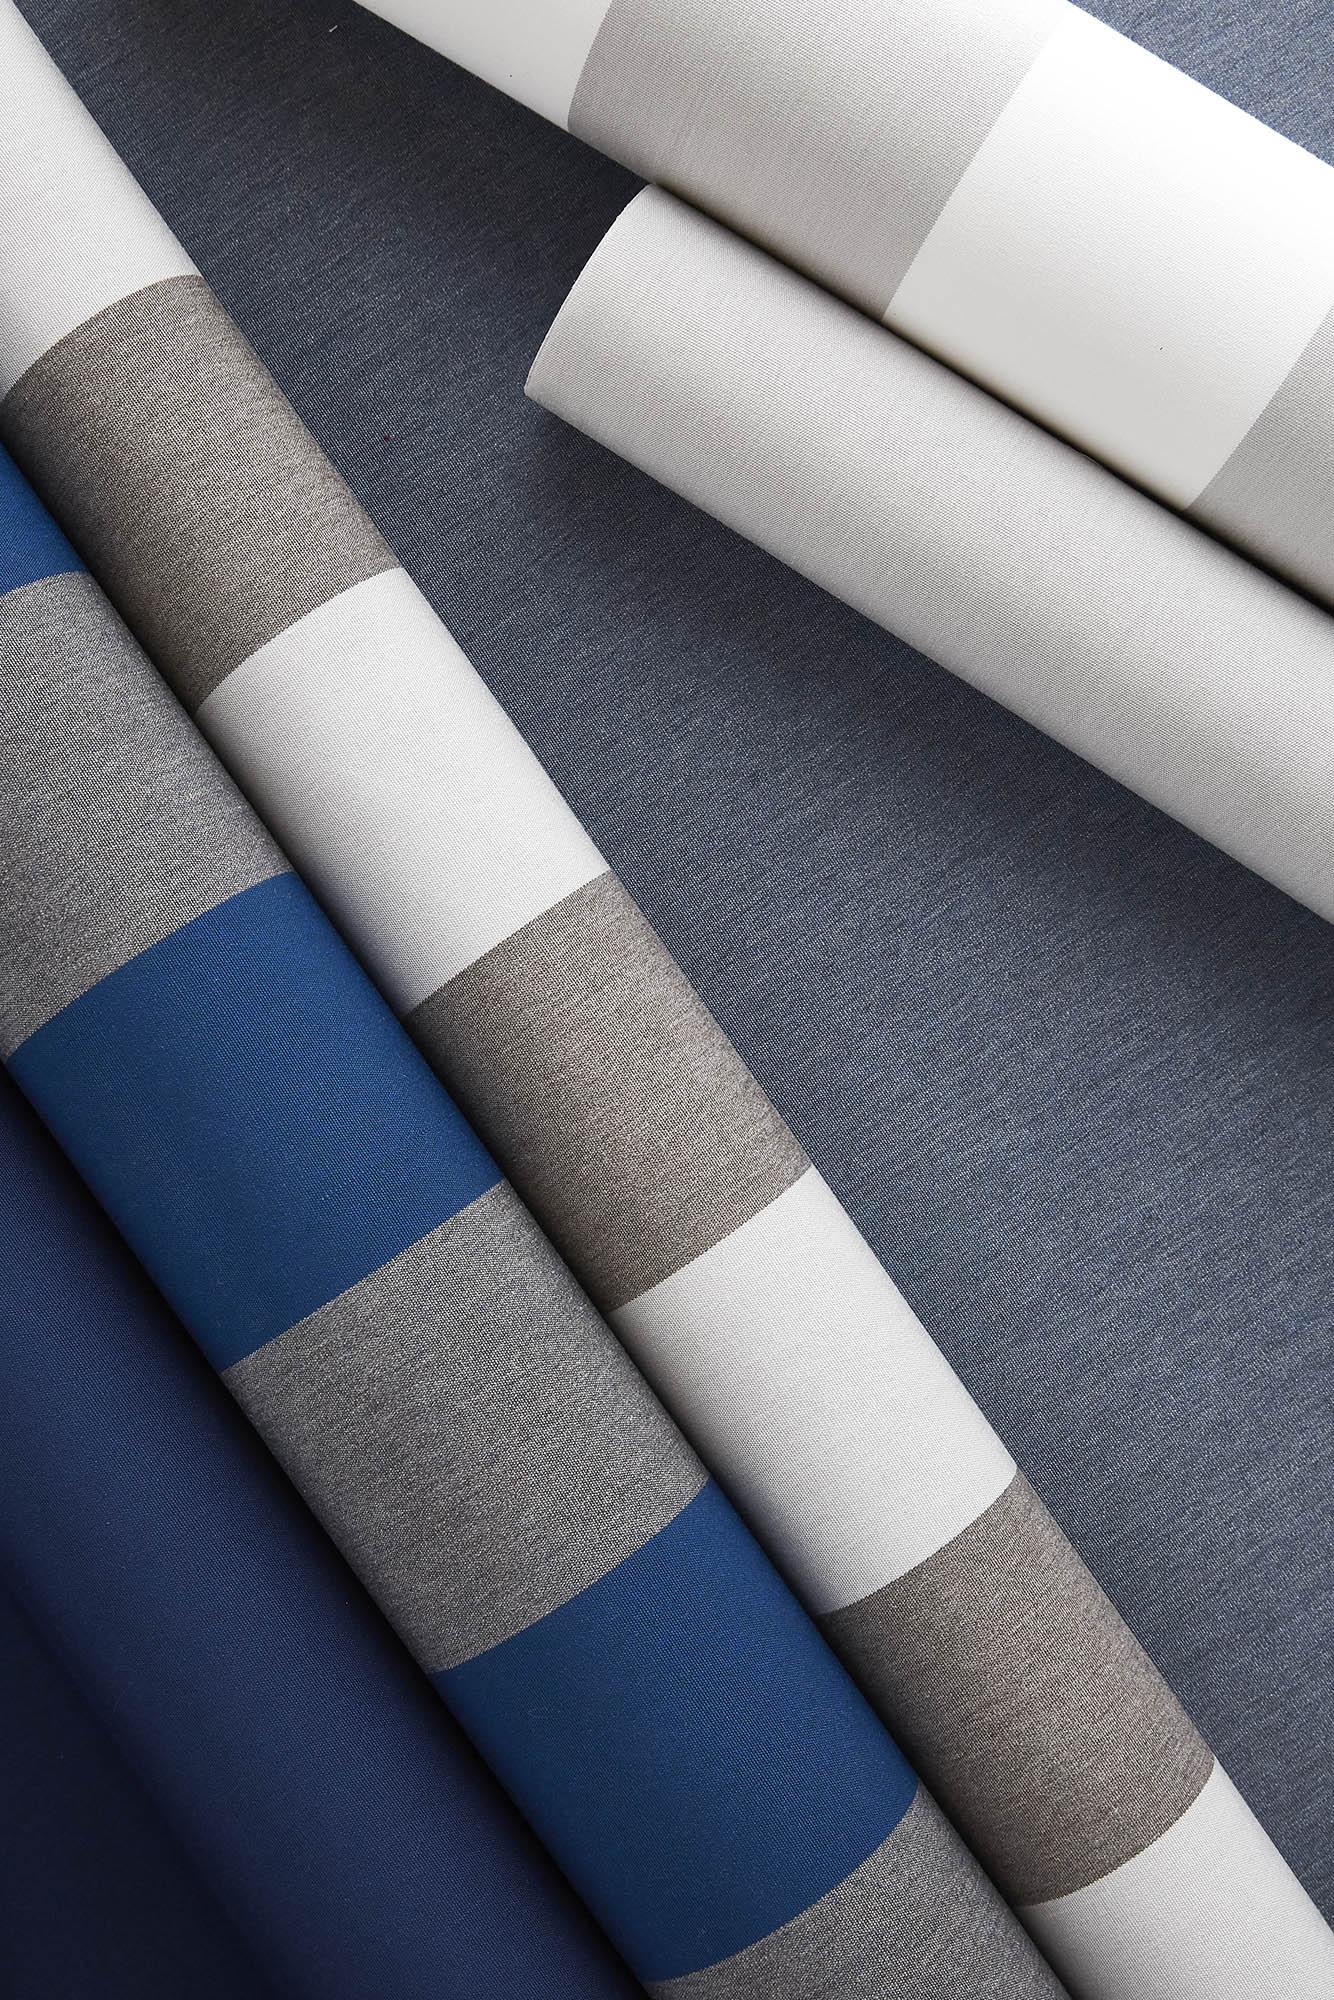 Sunbrella shade fabrics featuring new Beaufort stripes